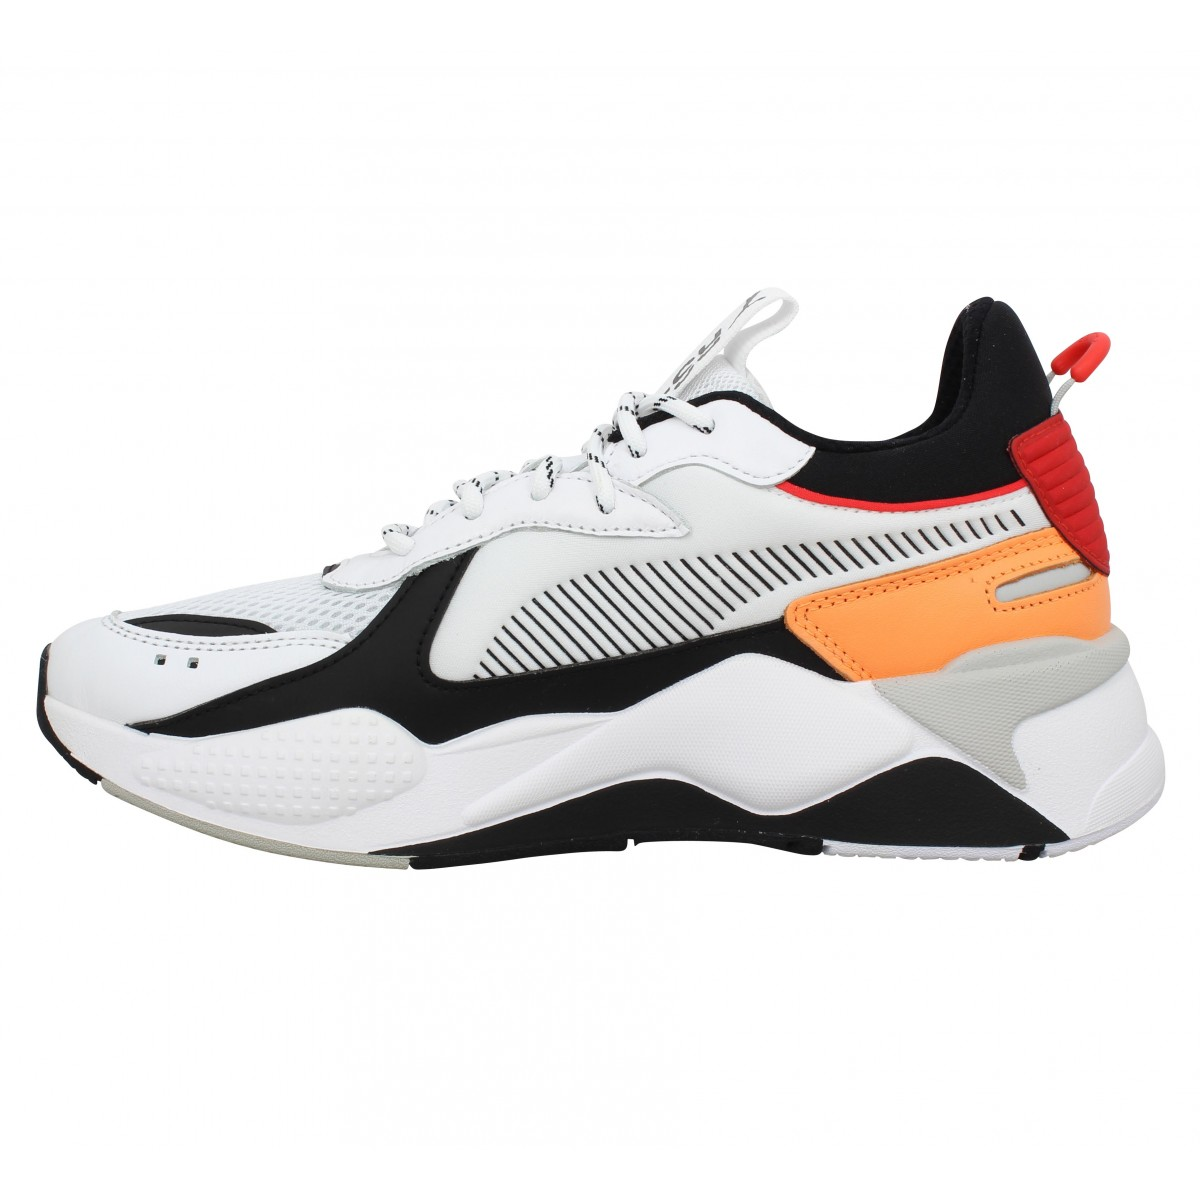 chaussure puma rs x blanche